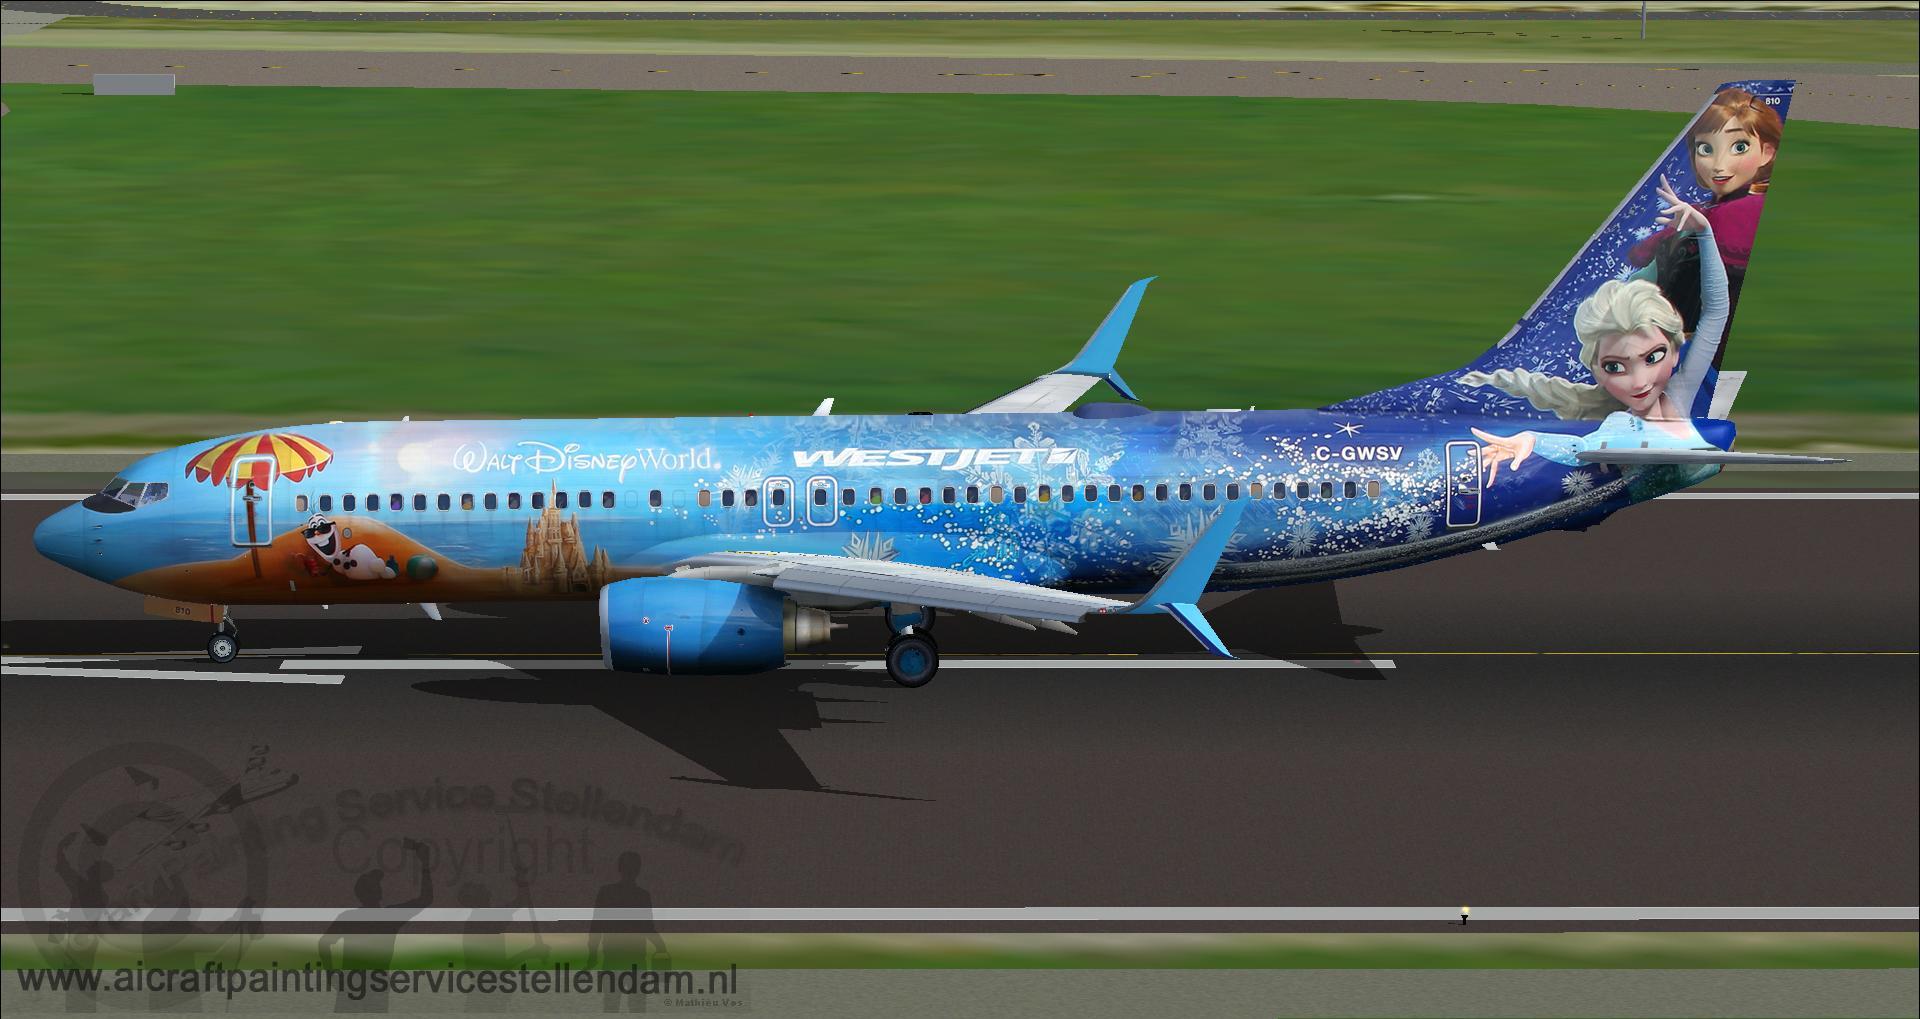 TDSB737-800Westjet_Frozen_C-GWSV